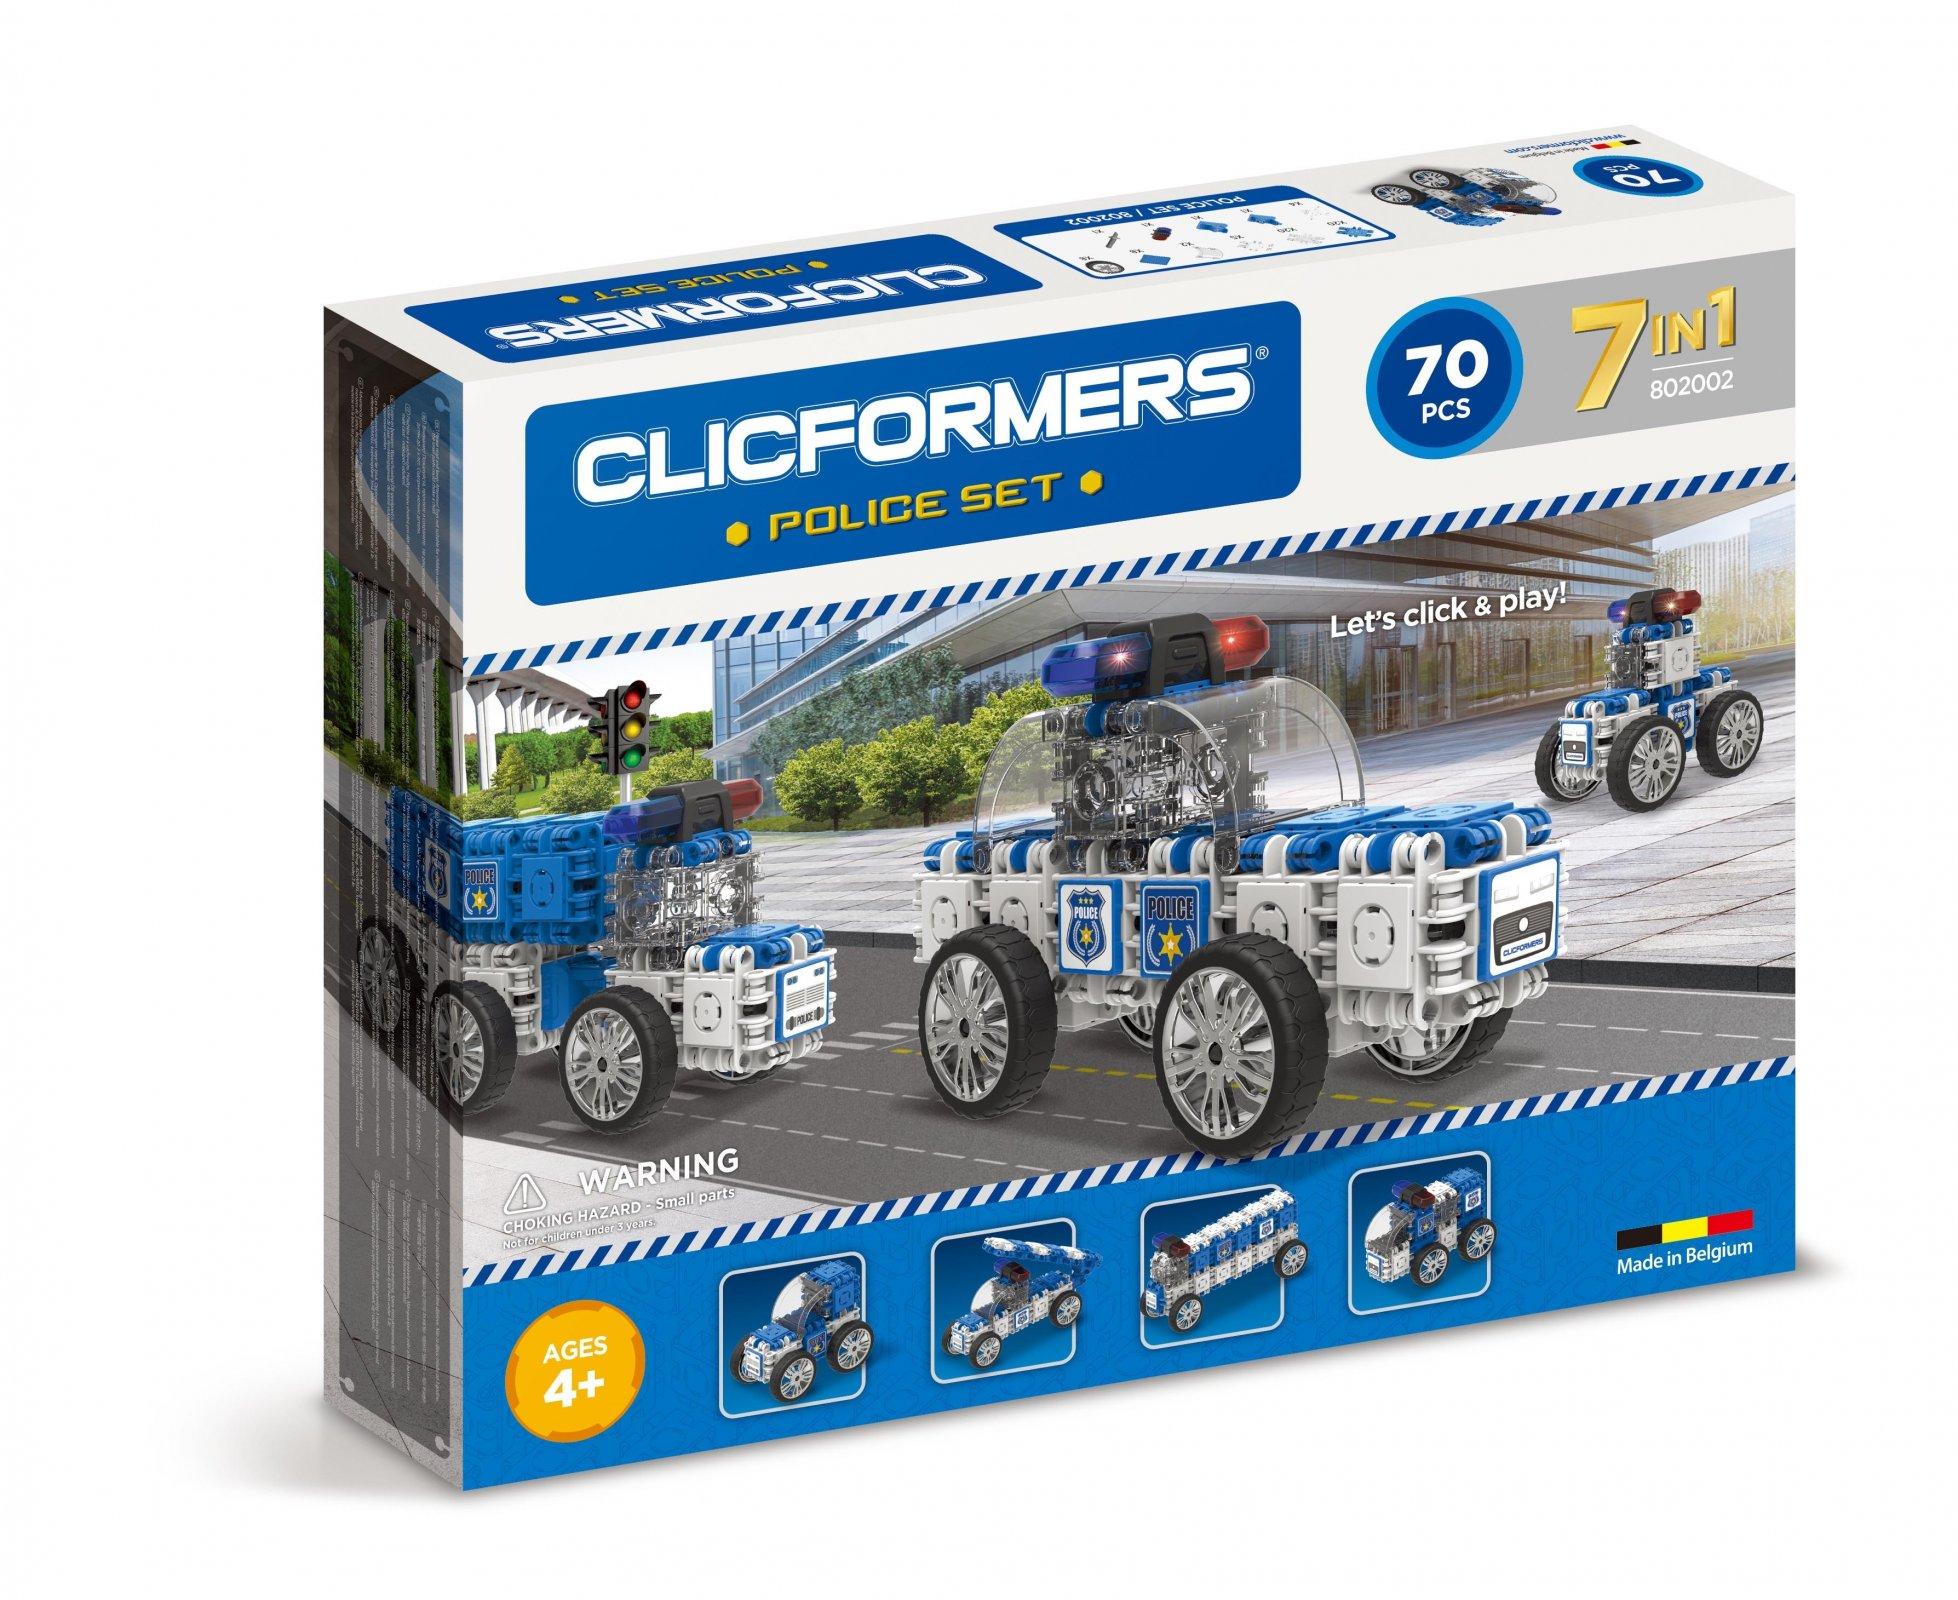 CLICFORMERS Police Set 72 PCS